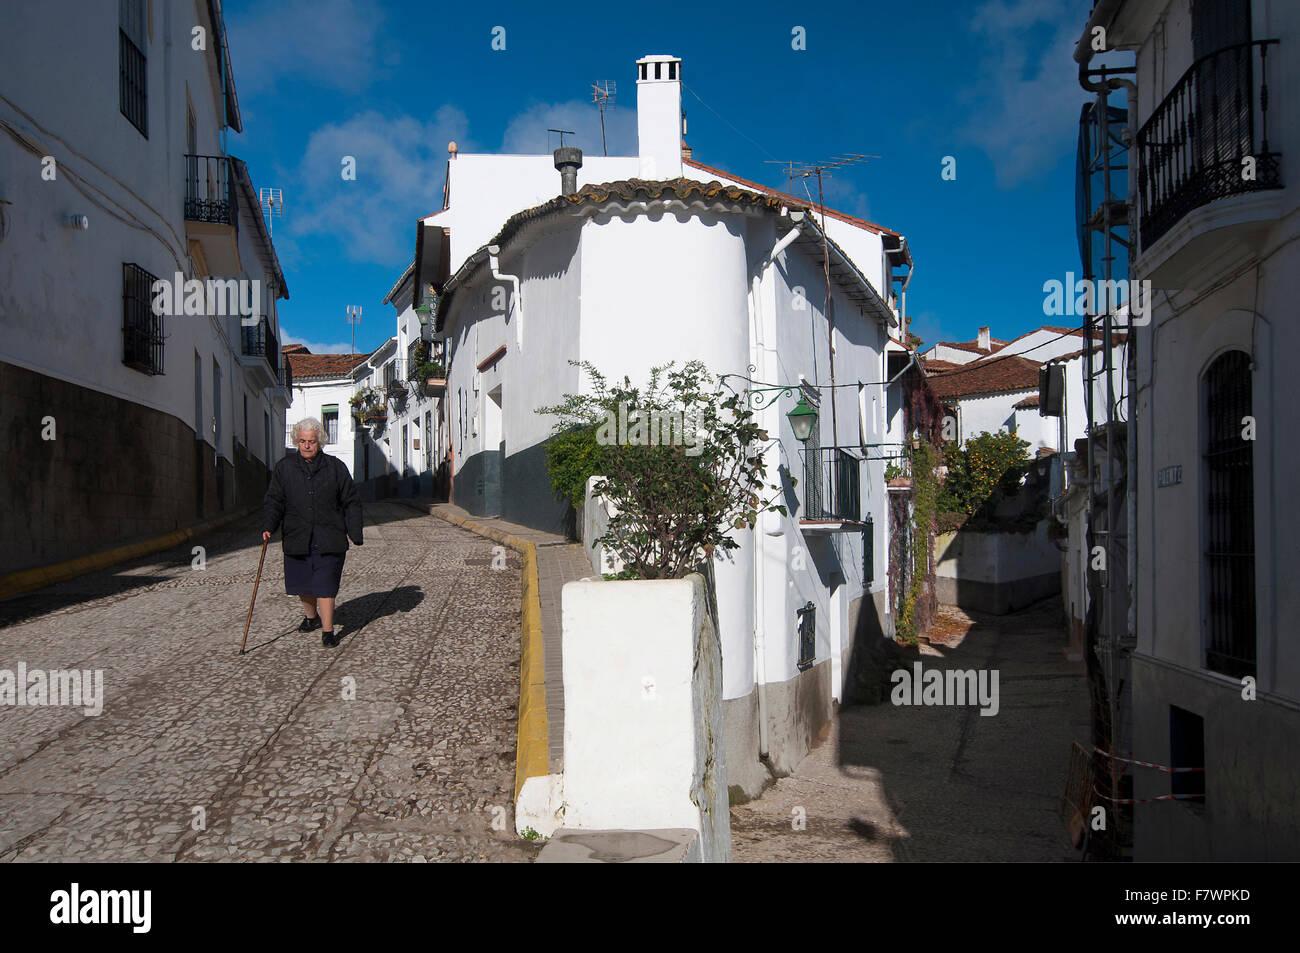 Urban view, Fuenteheridos, Huelva-province, Region of Andalusia, Spain, Europe - Stock Image